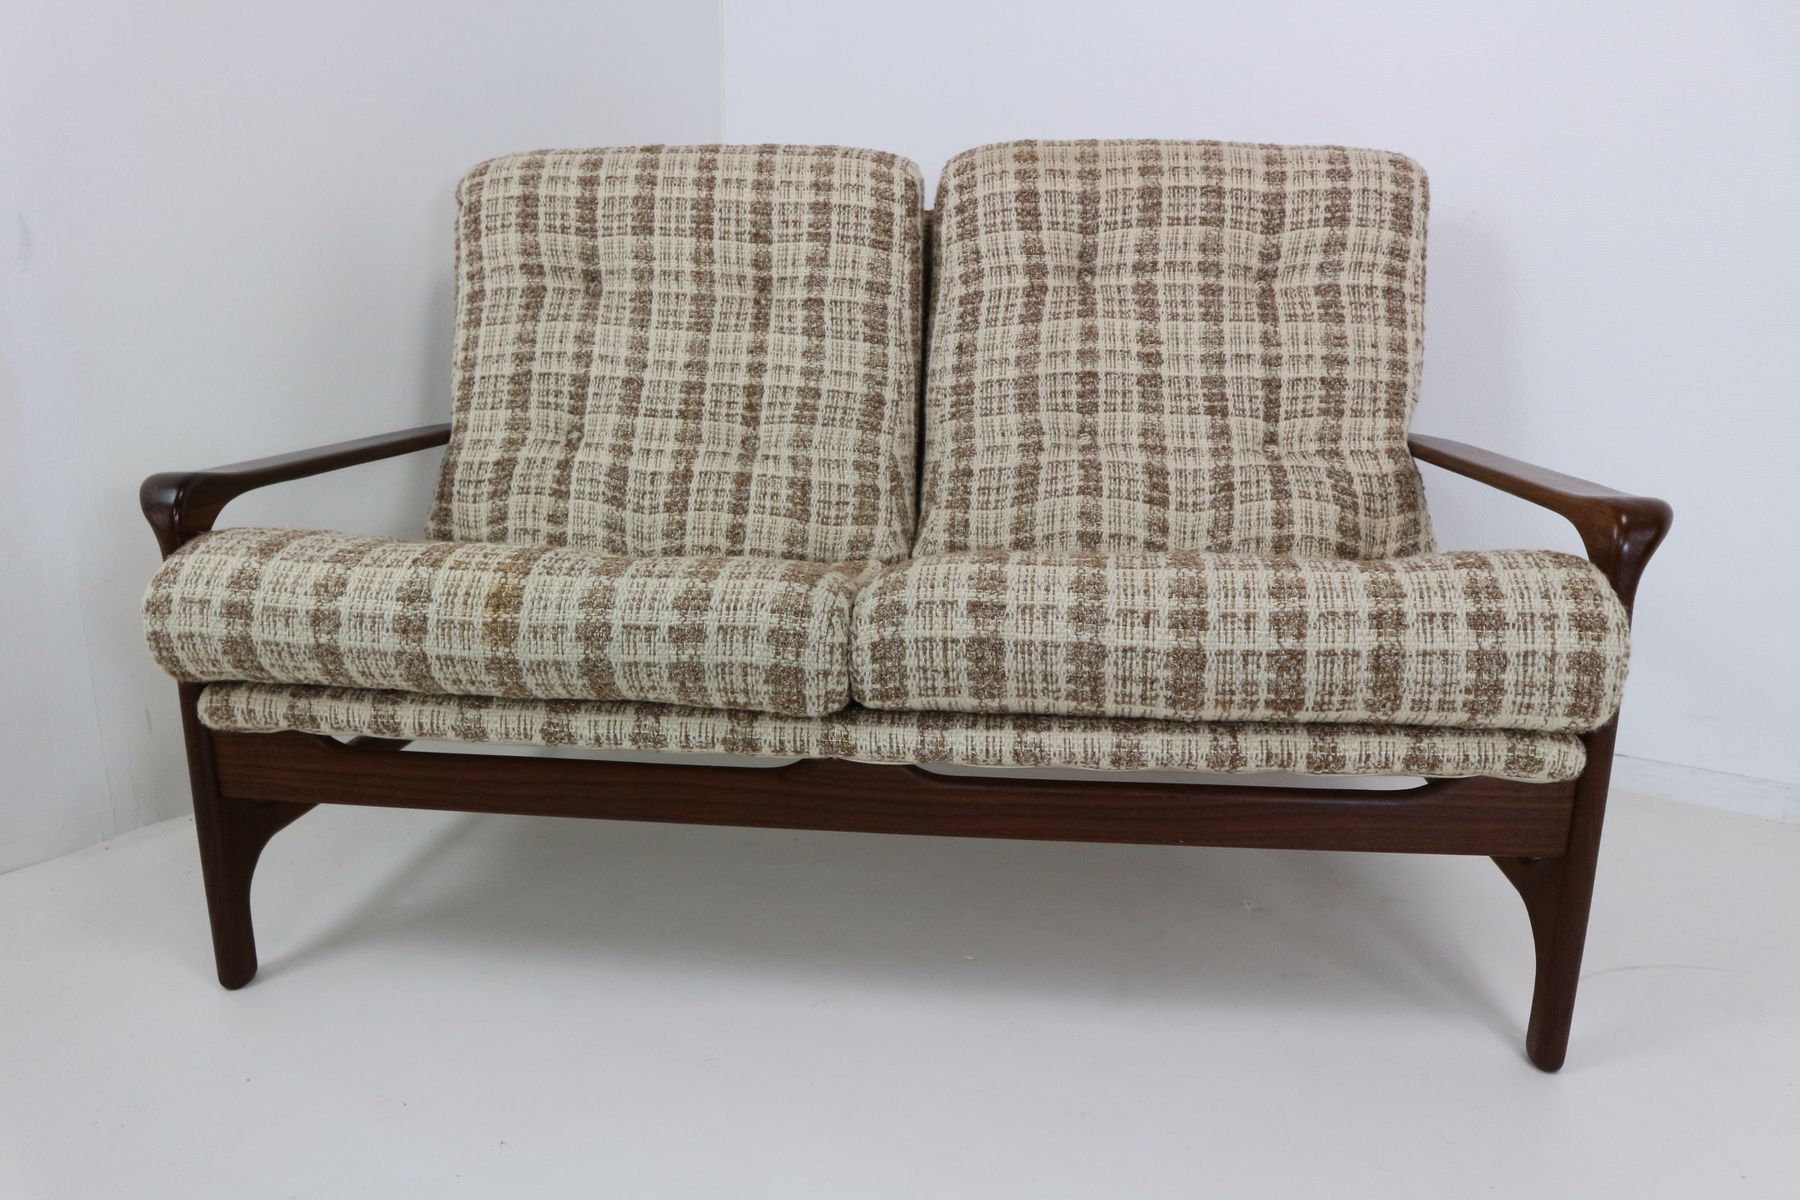 organisch geformter vintage 2 sitzer sofa aus palisander. Black Bedroom Furniture Sets. Home Design Ideas